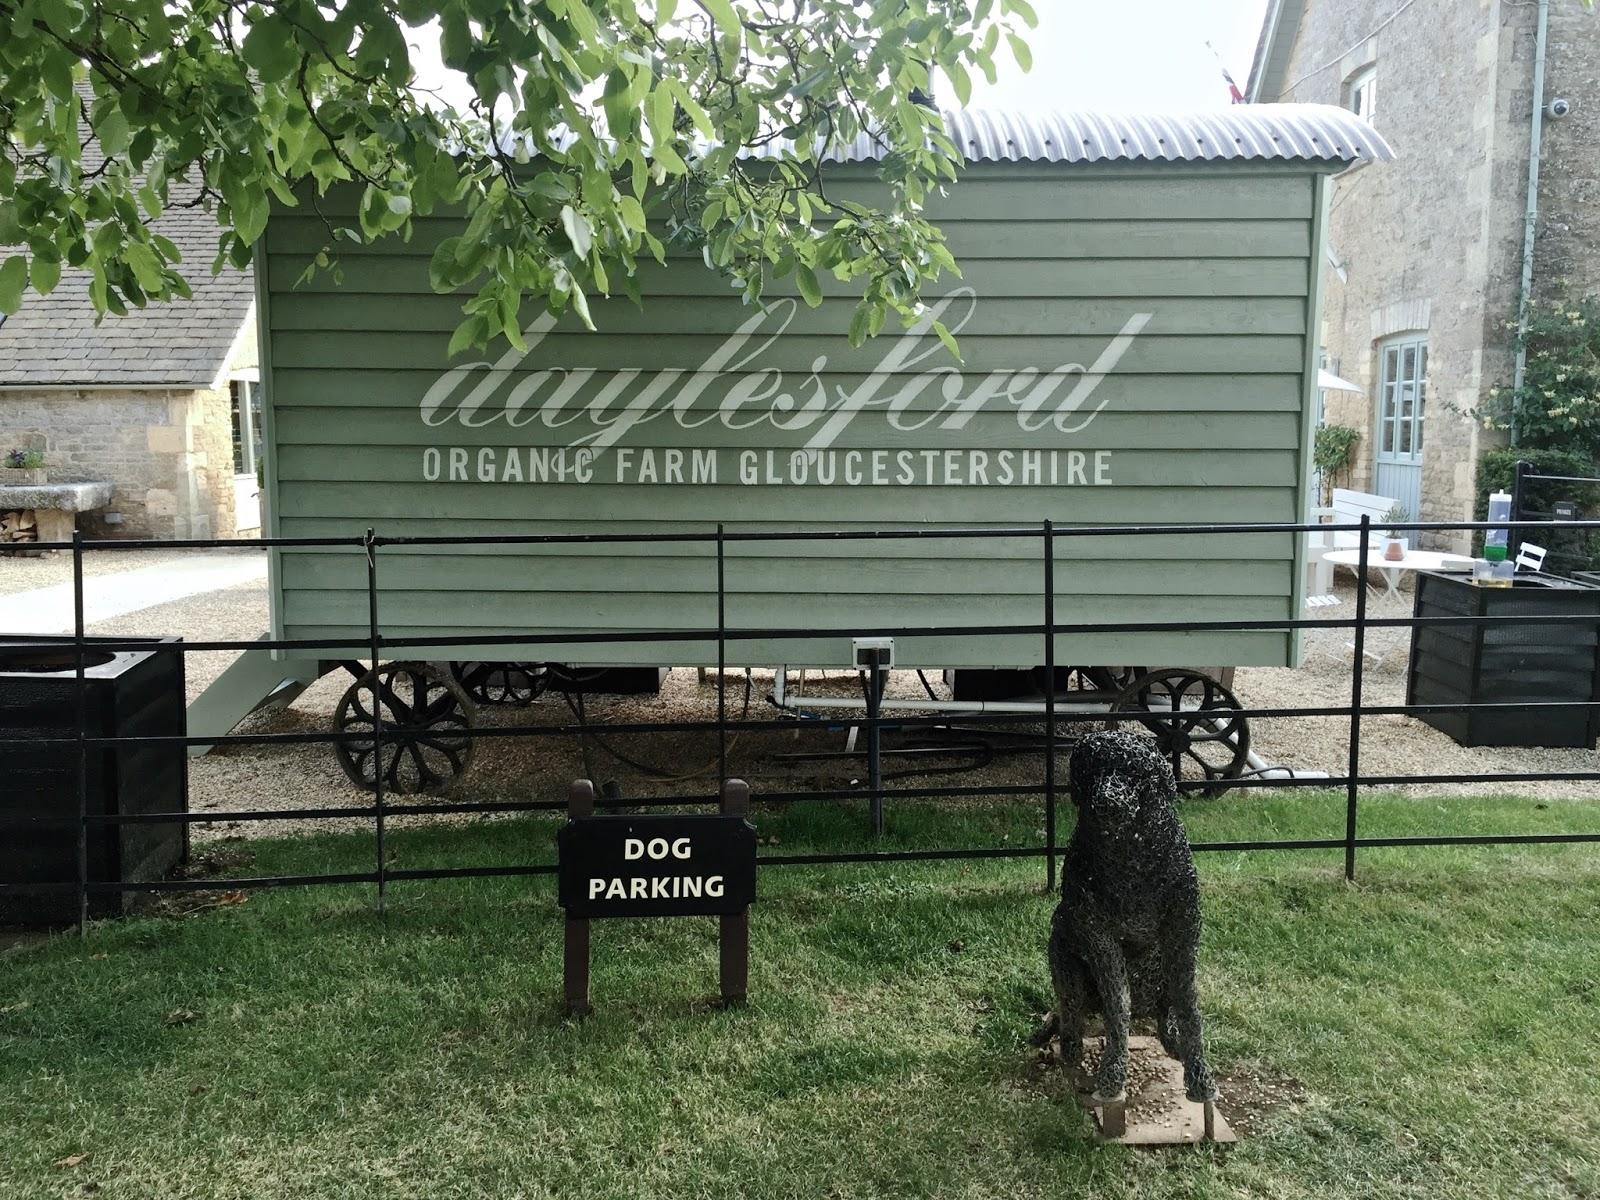 Daylesford Organic Farm in Gloucestershire Dog Parking